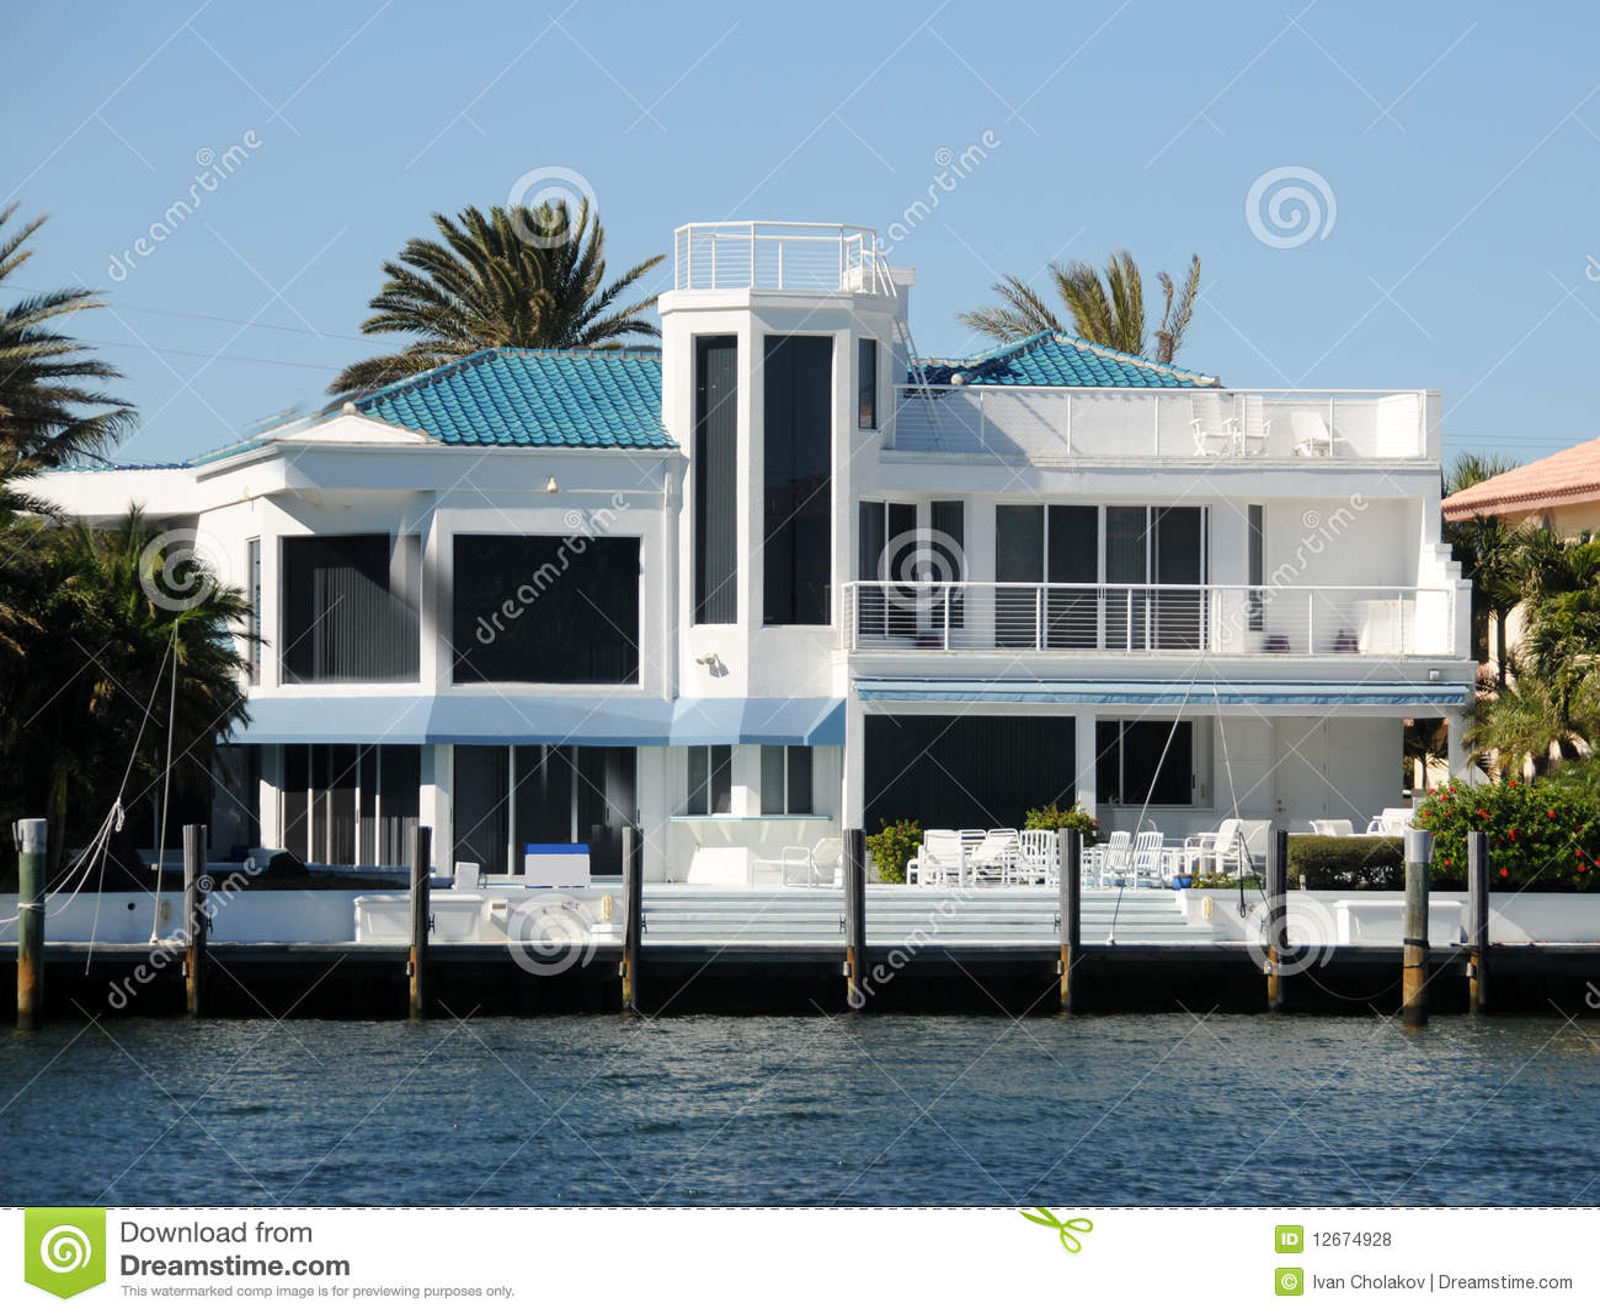 HD wallpapers maison moderne a vendre bord de mer